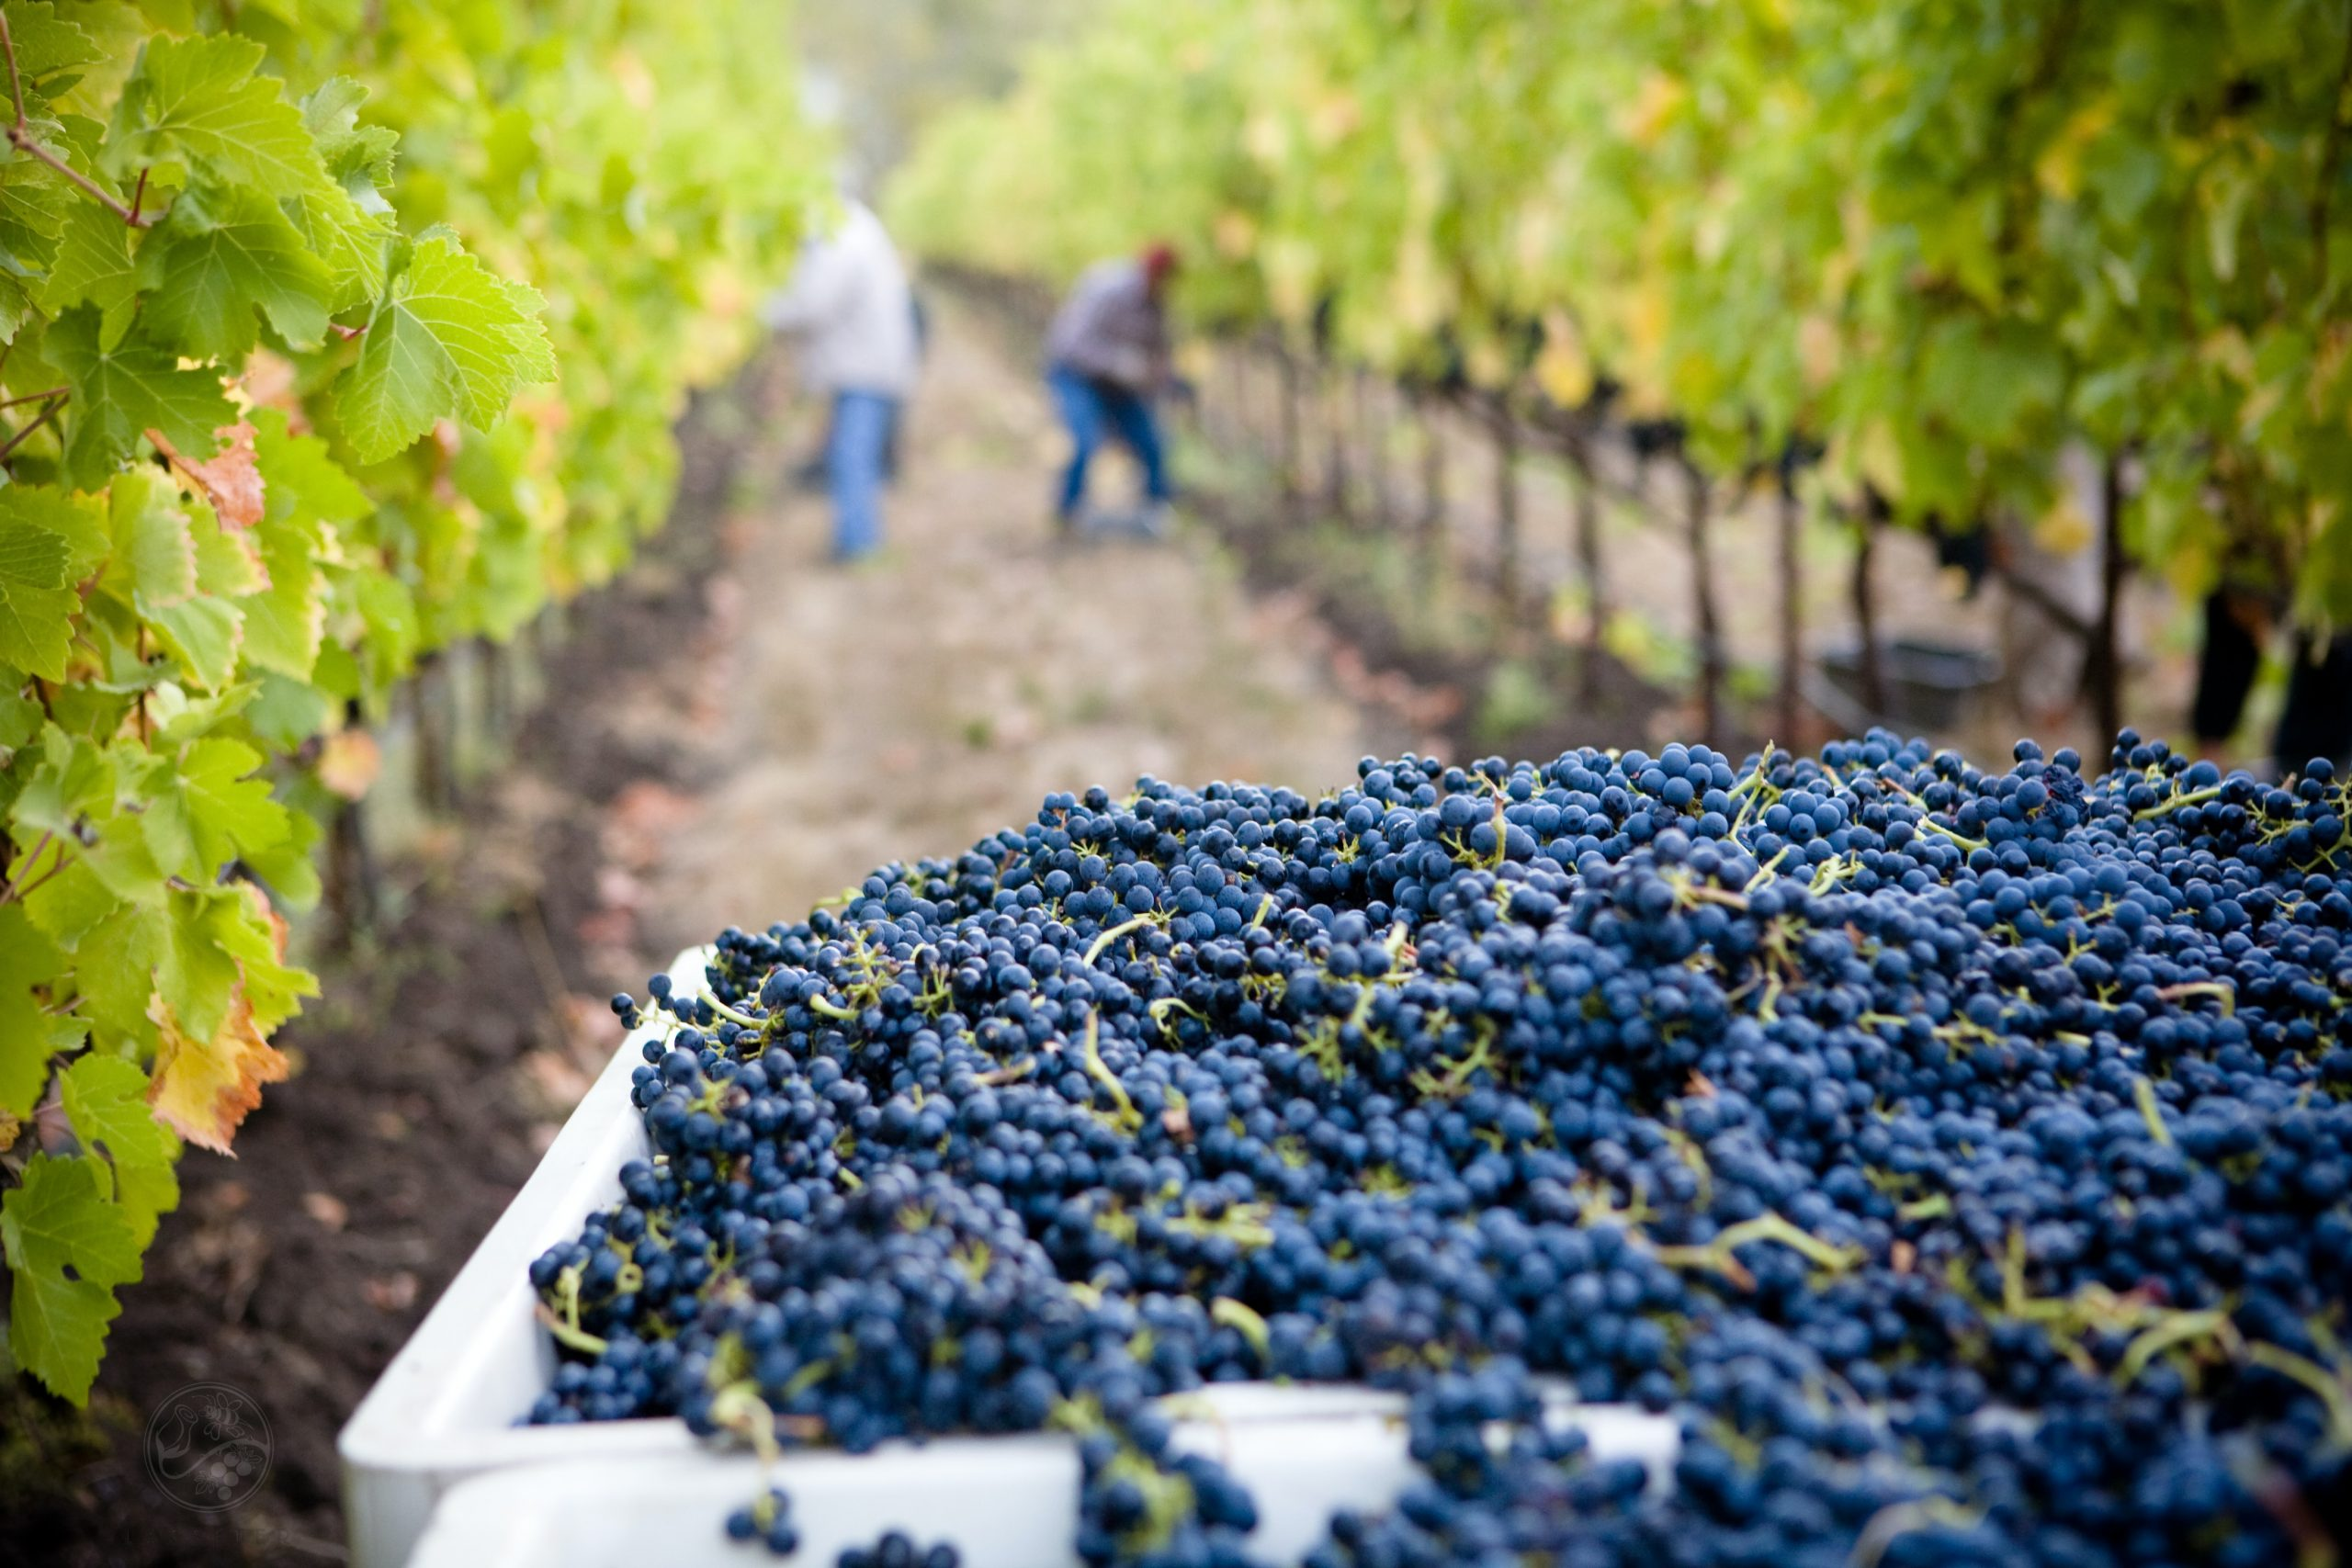 lasseter-winery-asG1QSDvb4g-unsplash